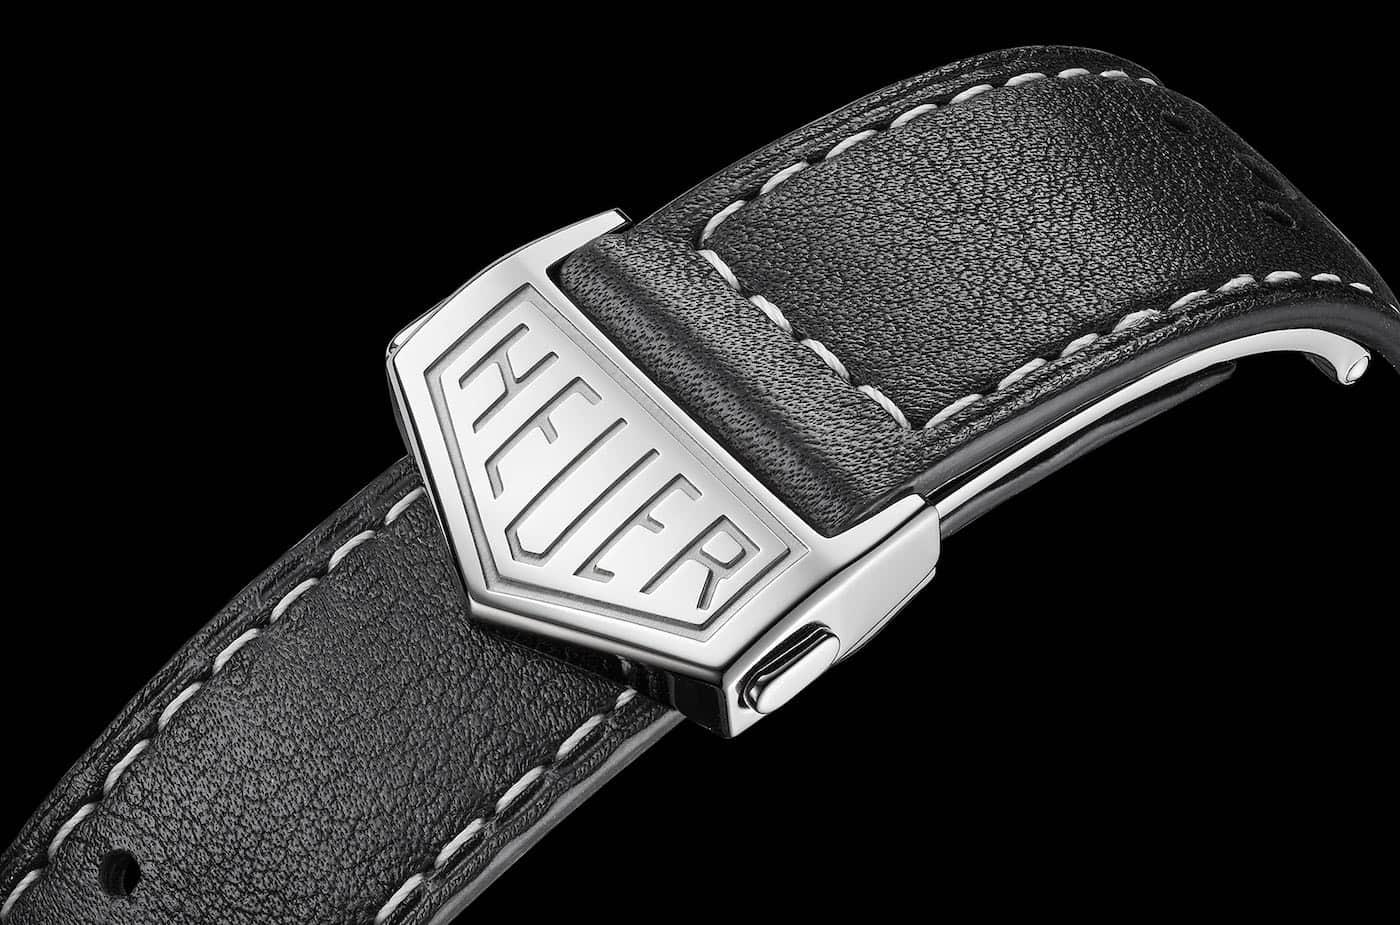 TAG Heuer Monaco Limited Edition No 4 Watch 1